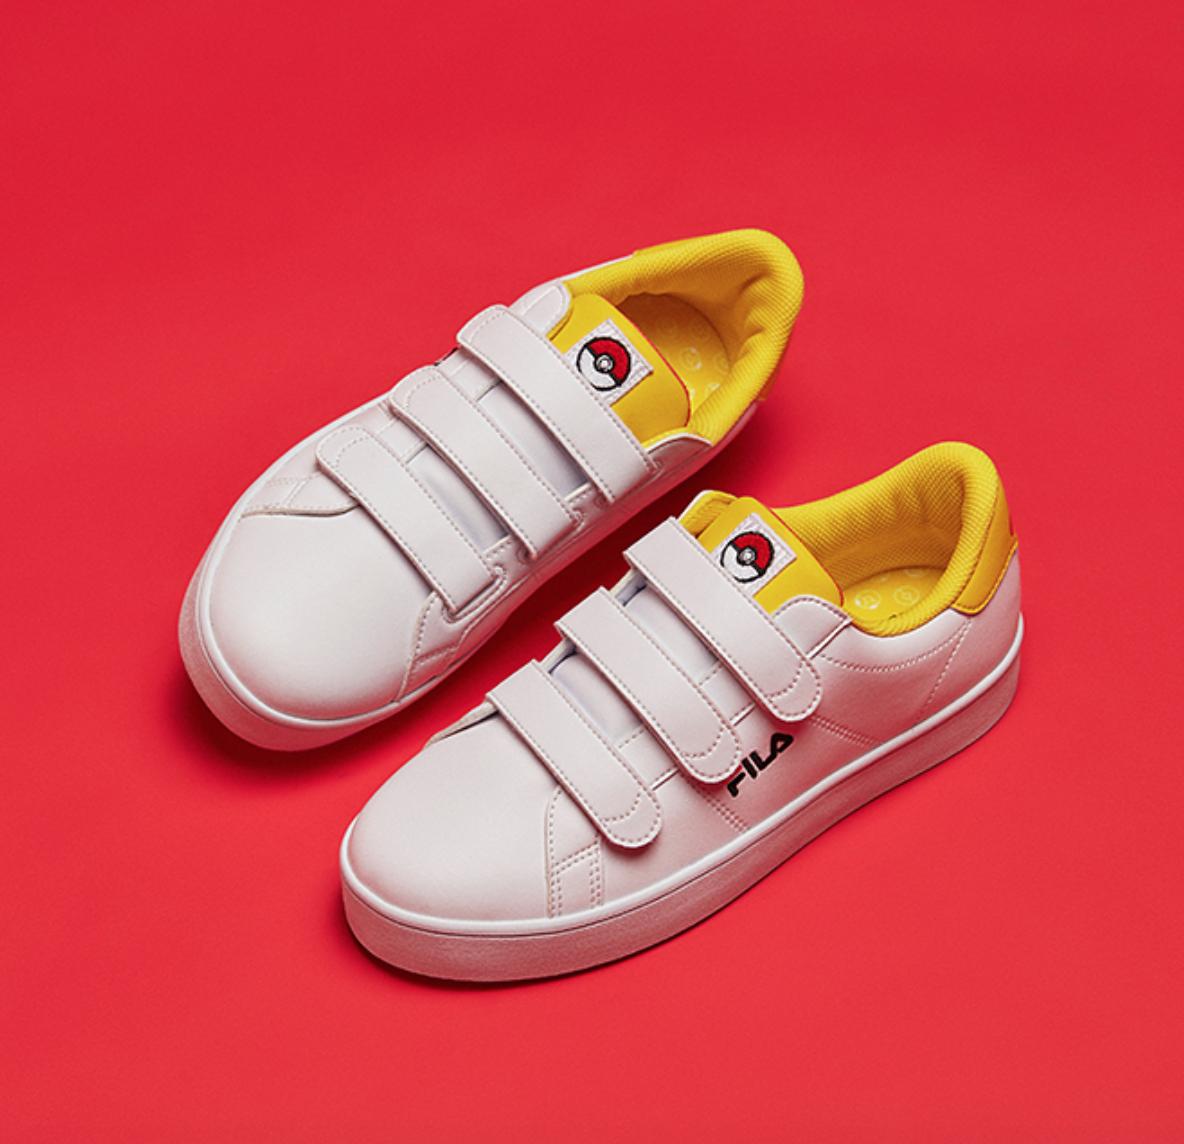 FILA x Pokemon Marks the Latest Sneaker